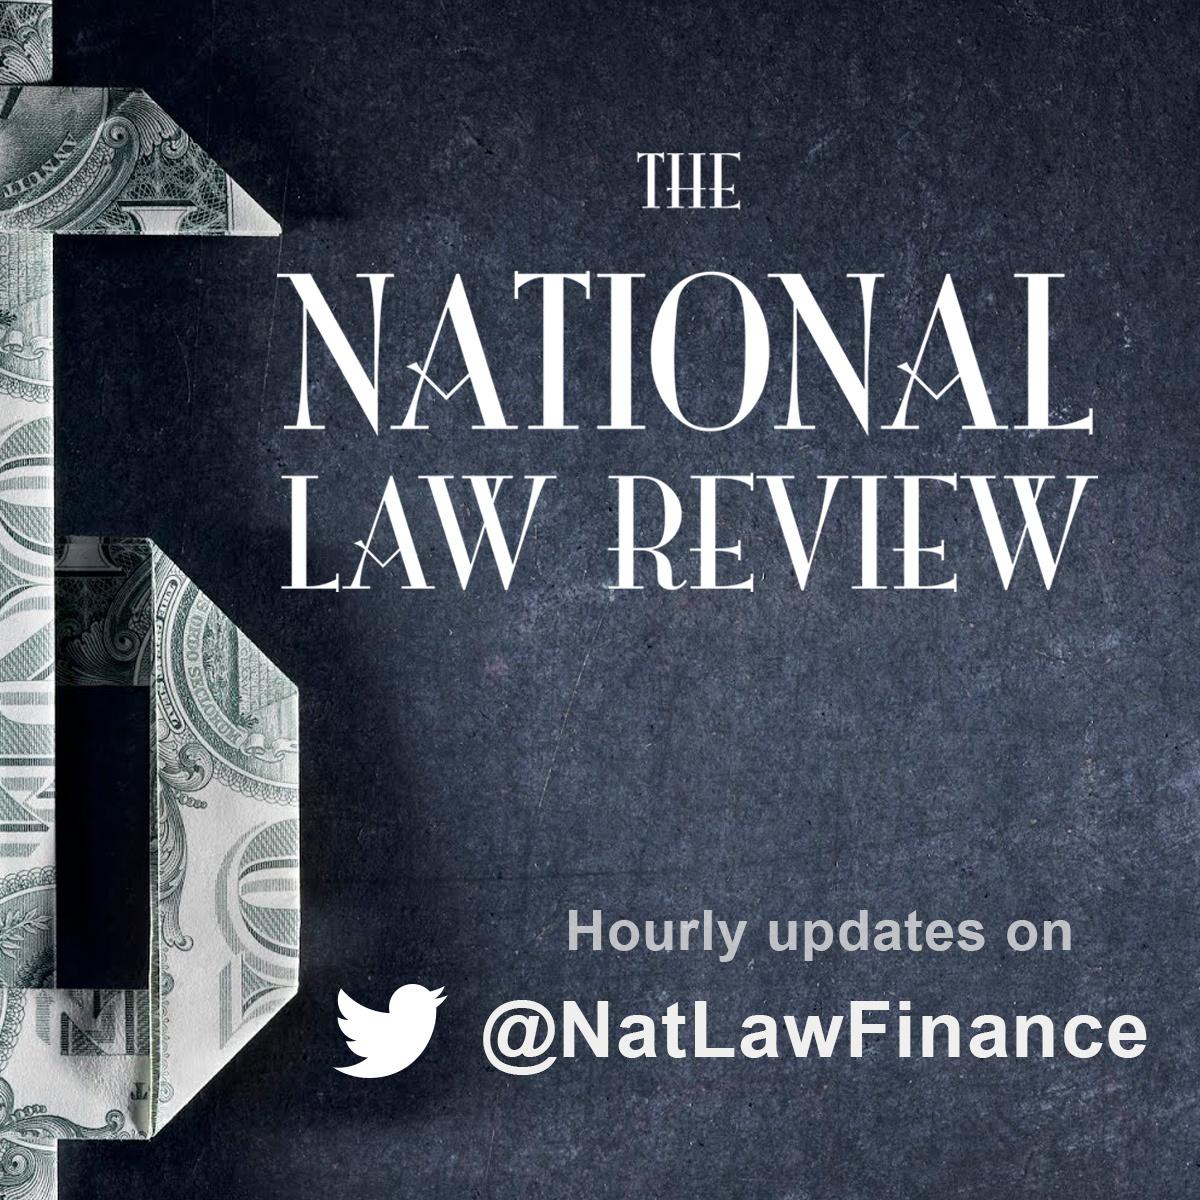 NLR finance twitter